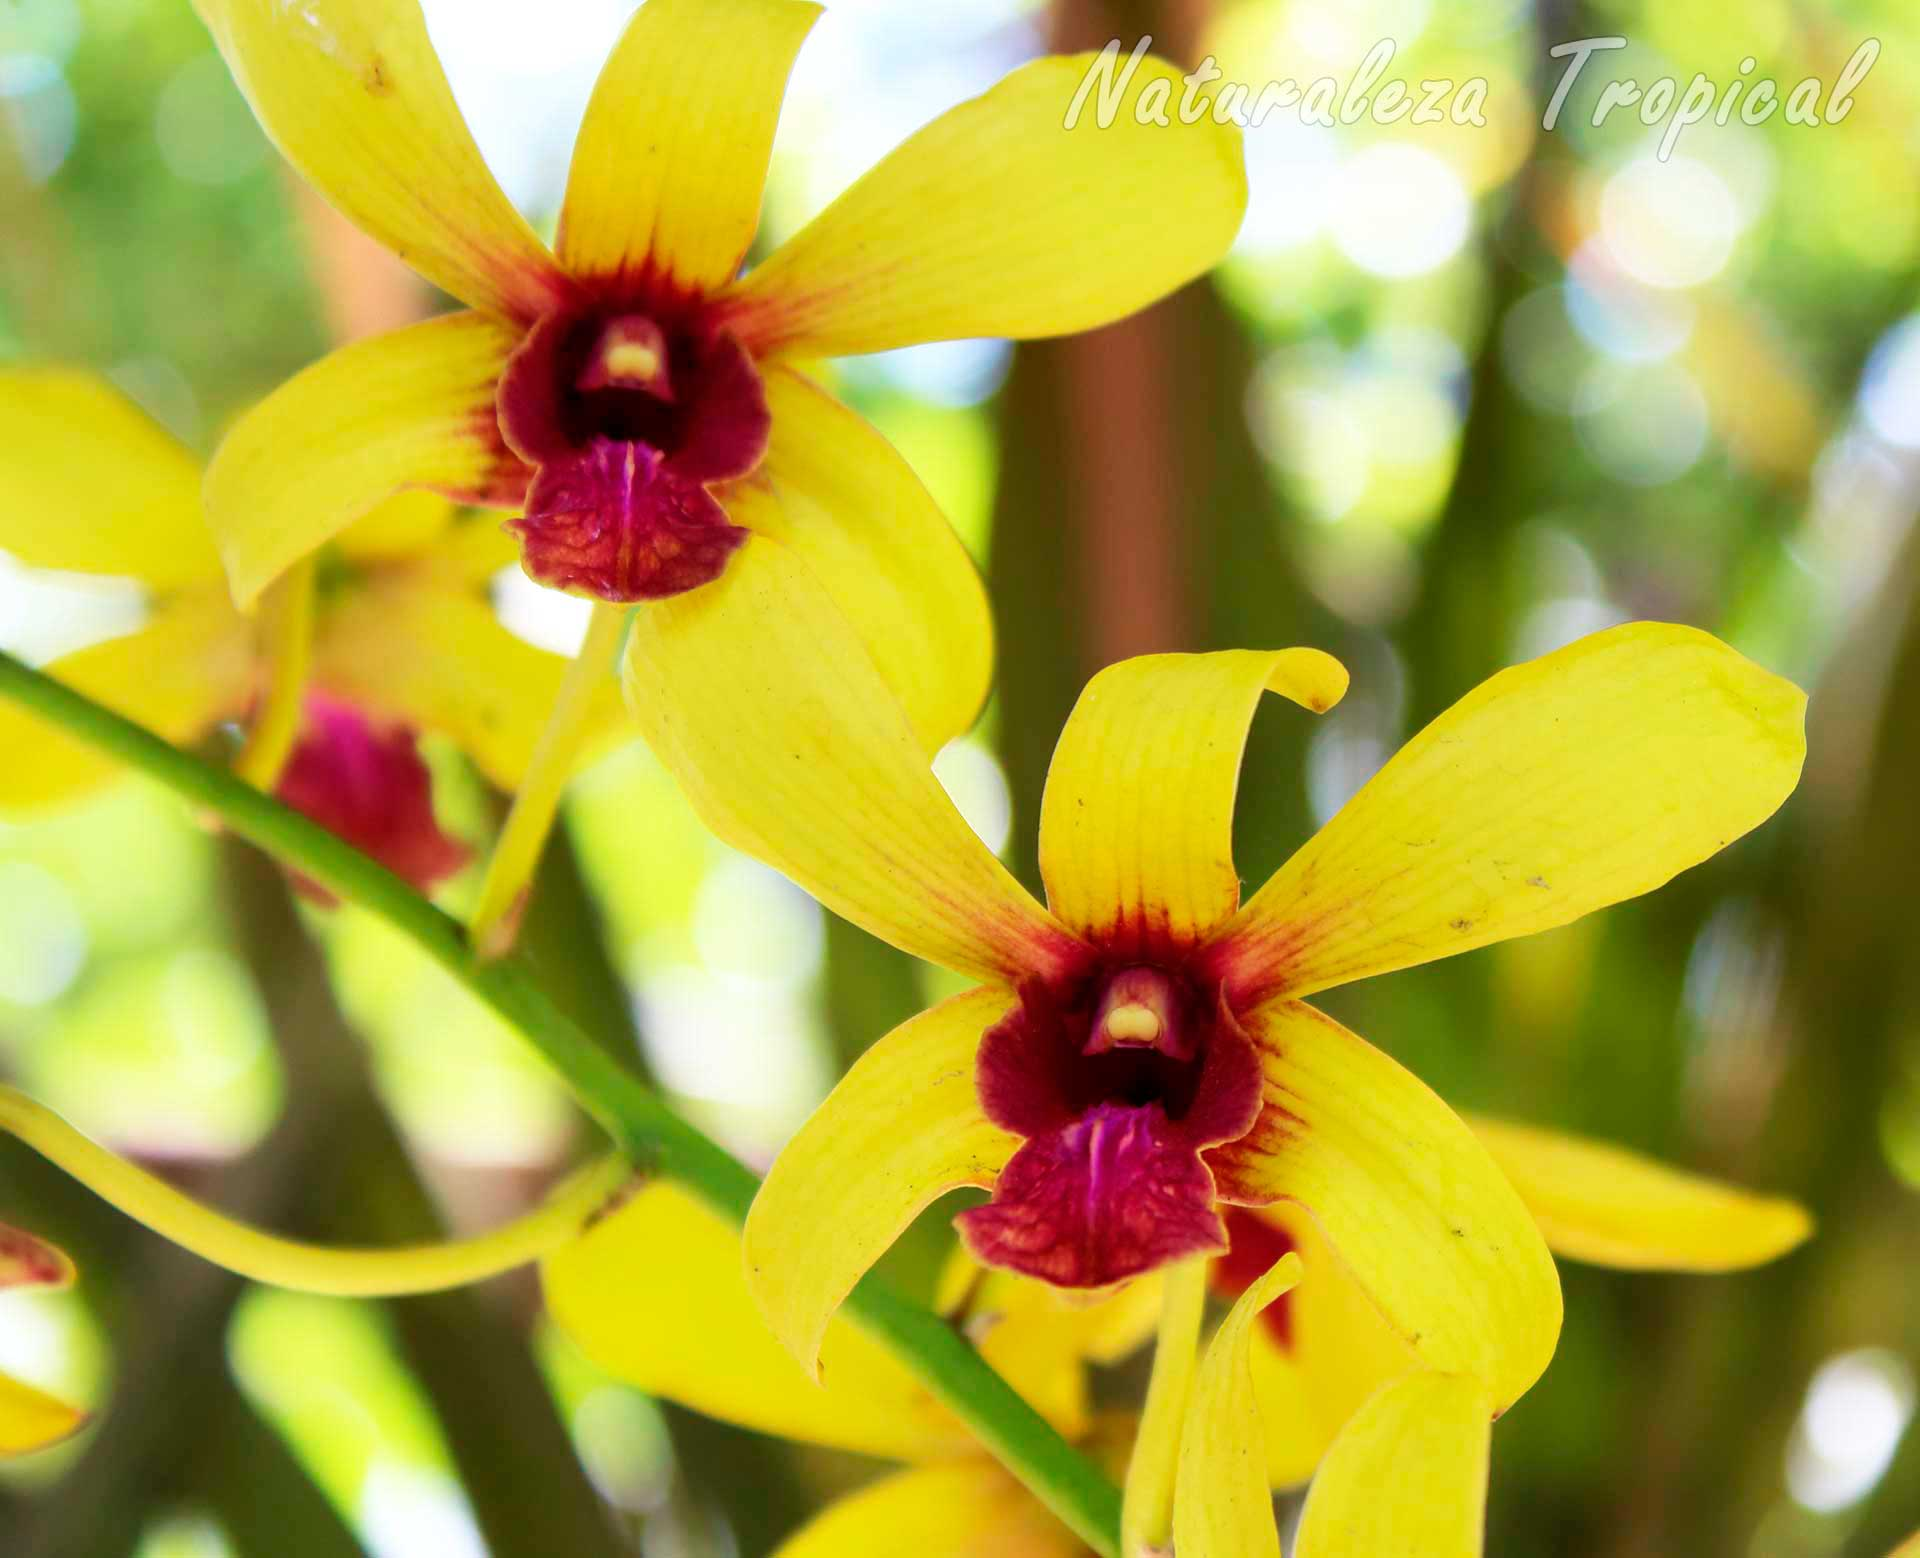 Flores distintivas de la orquídea Dendrobium ᶦThongchai Goldᶦ